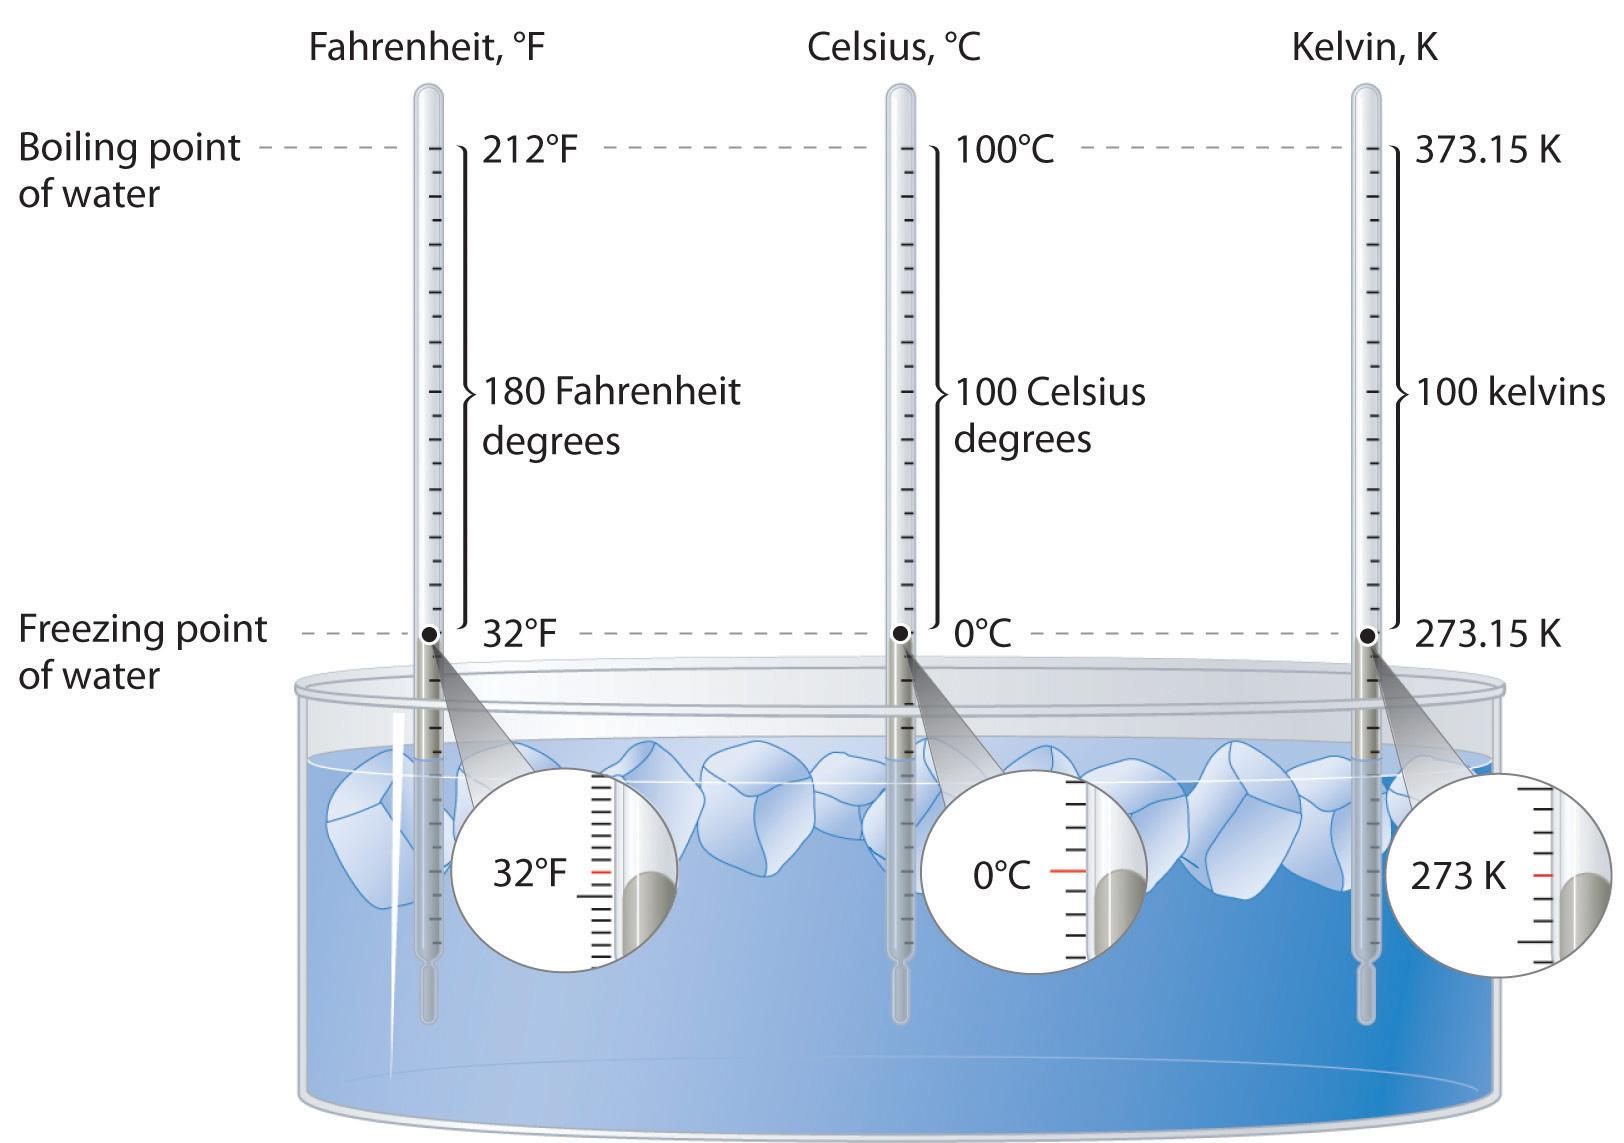 How do you convert 96 degrees Fahrenheit to Celsius?